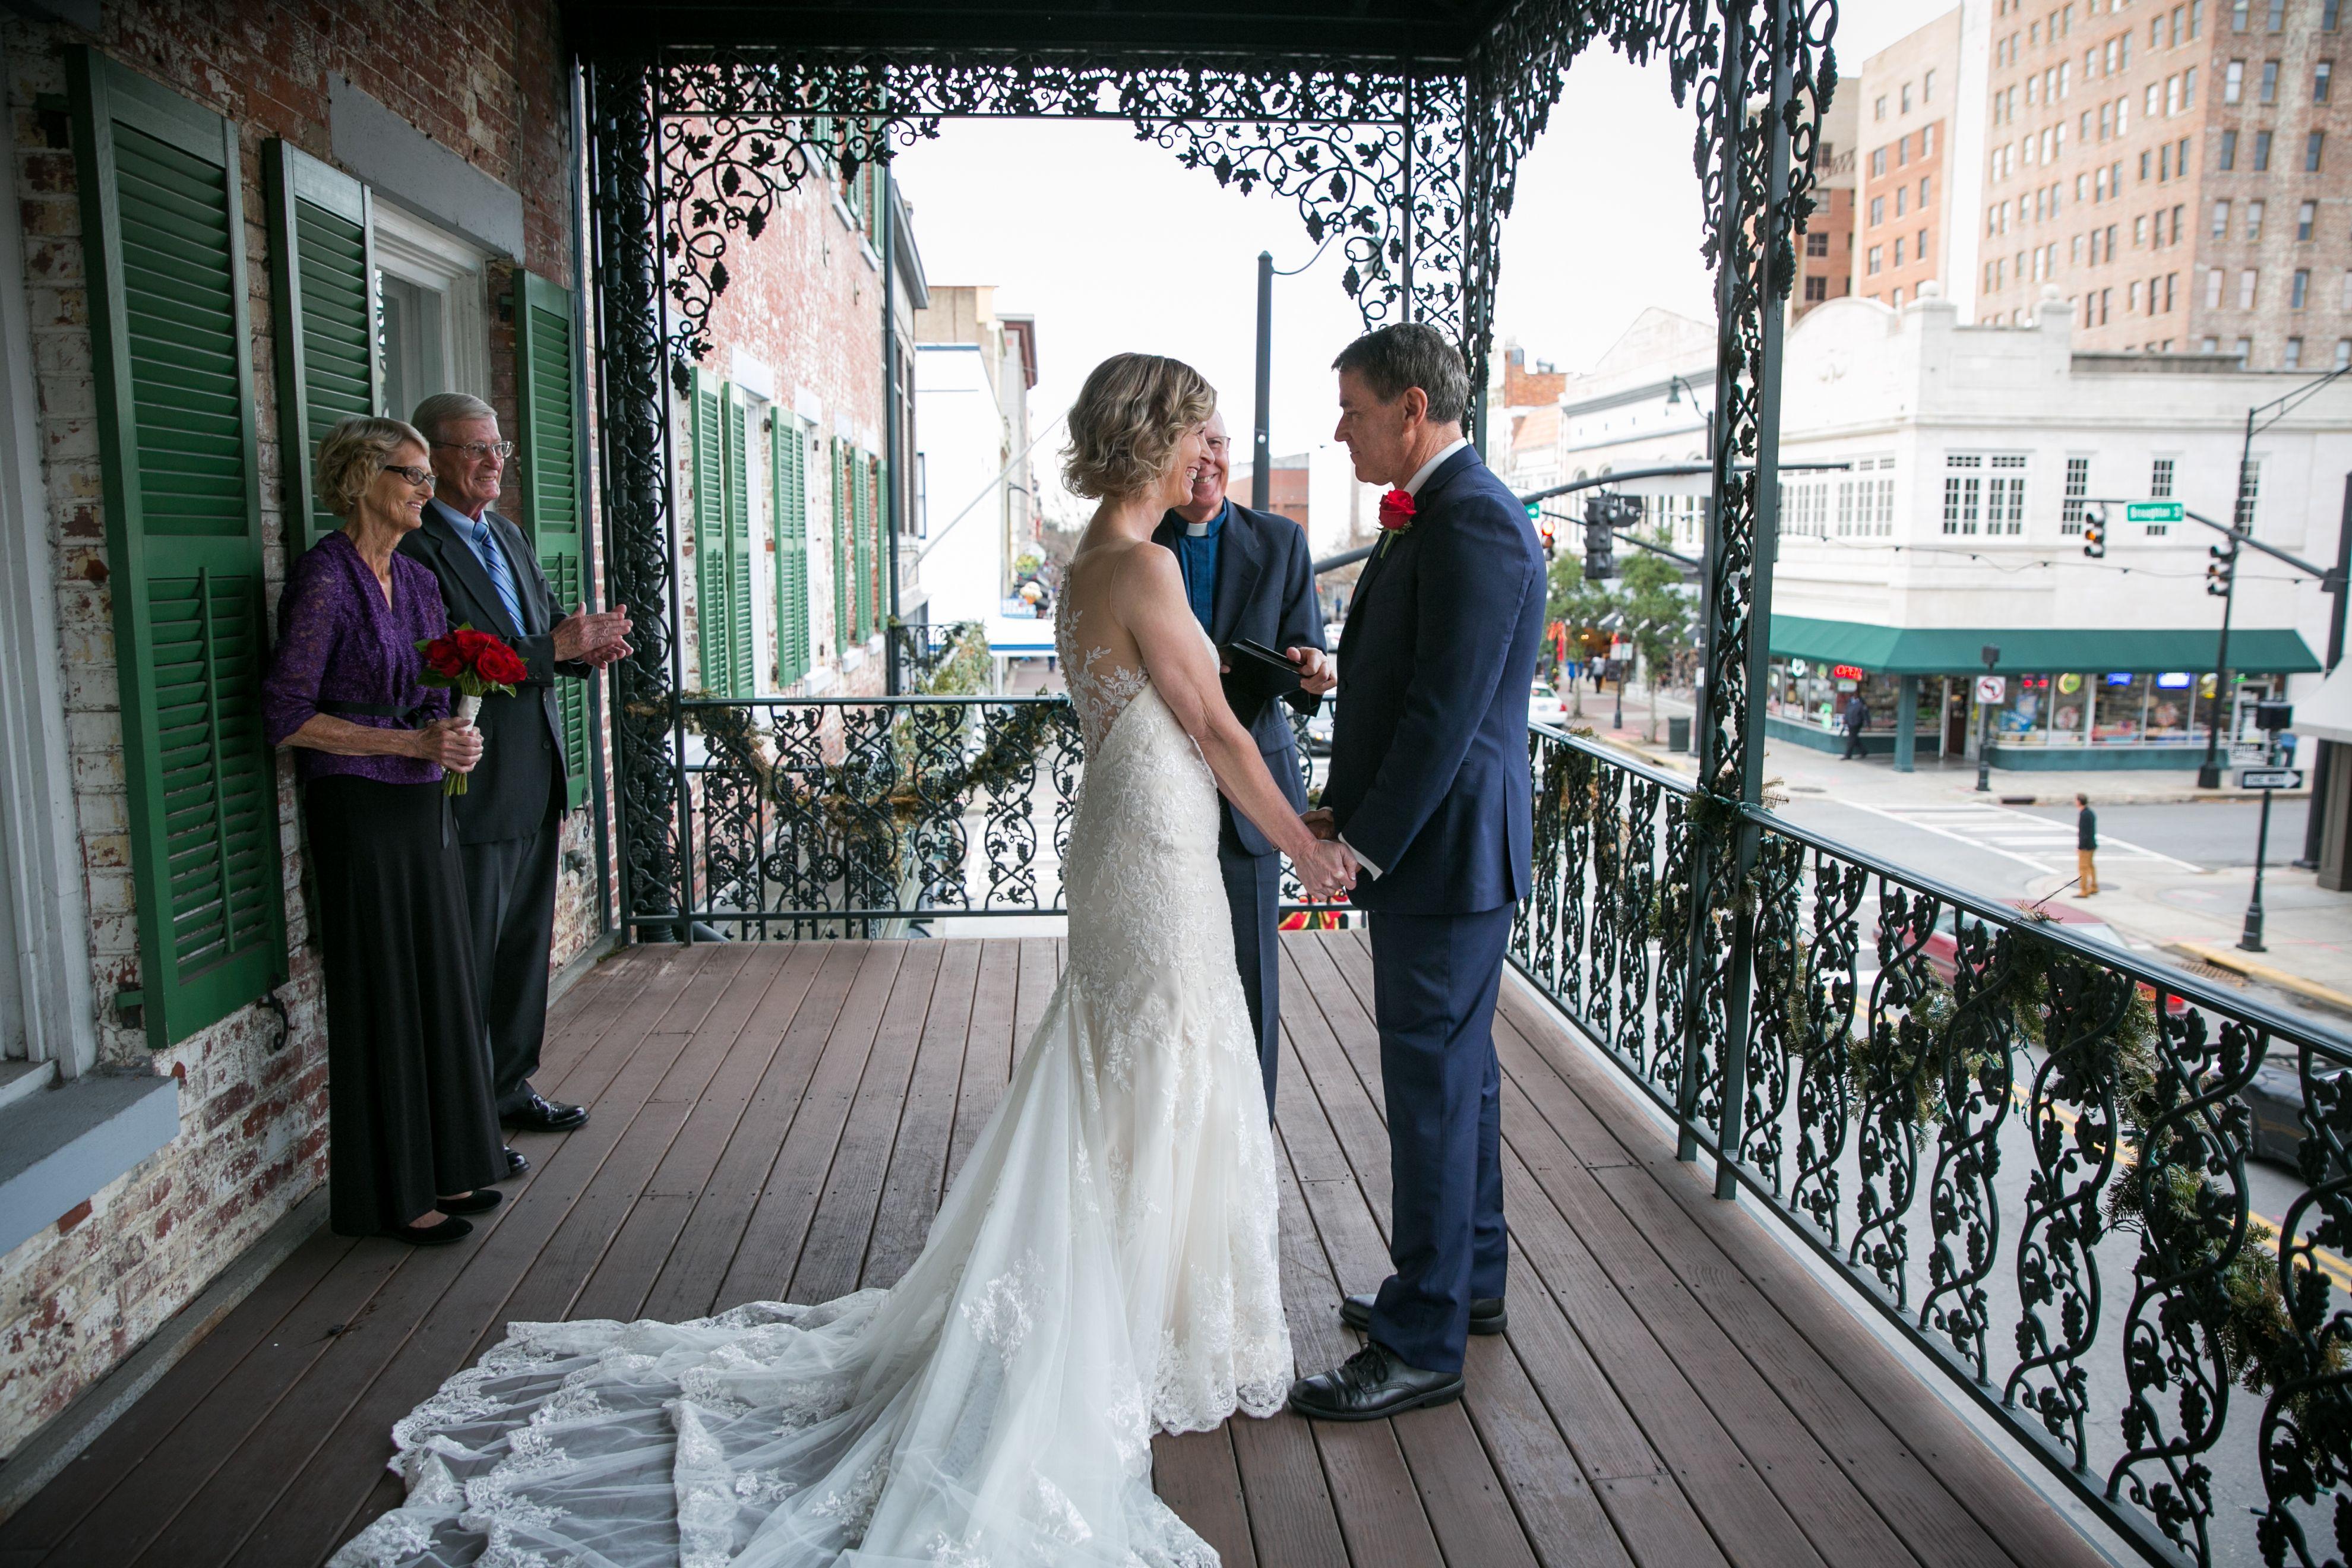 2017 Savannah Elopement Wedding Packages